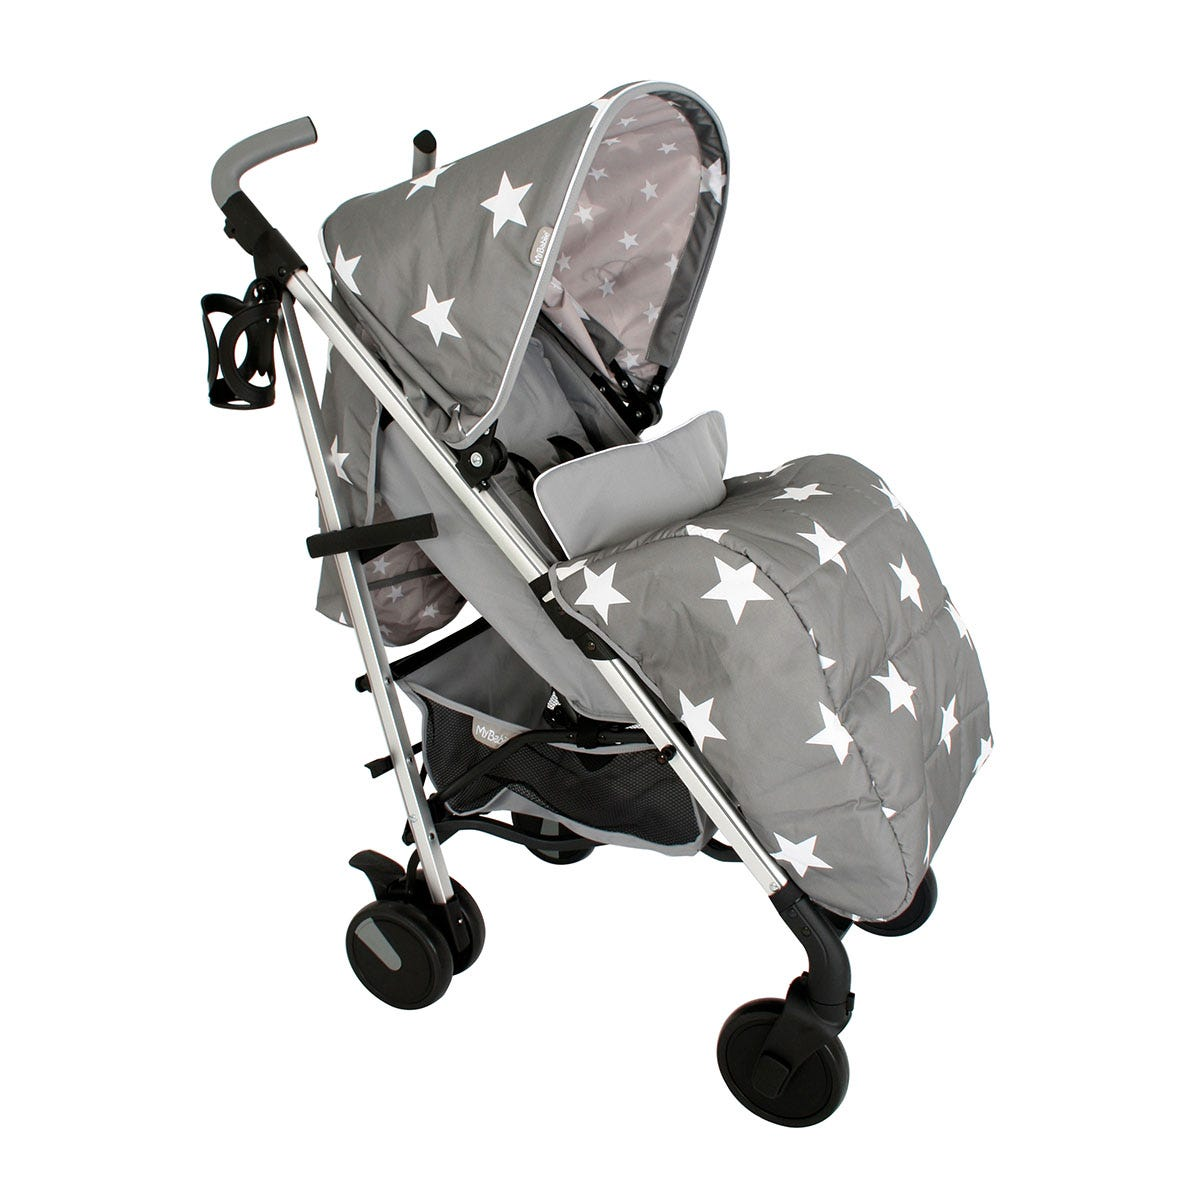 My Babiie Billie Faiers MB51 Stroller - Grey Stars